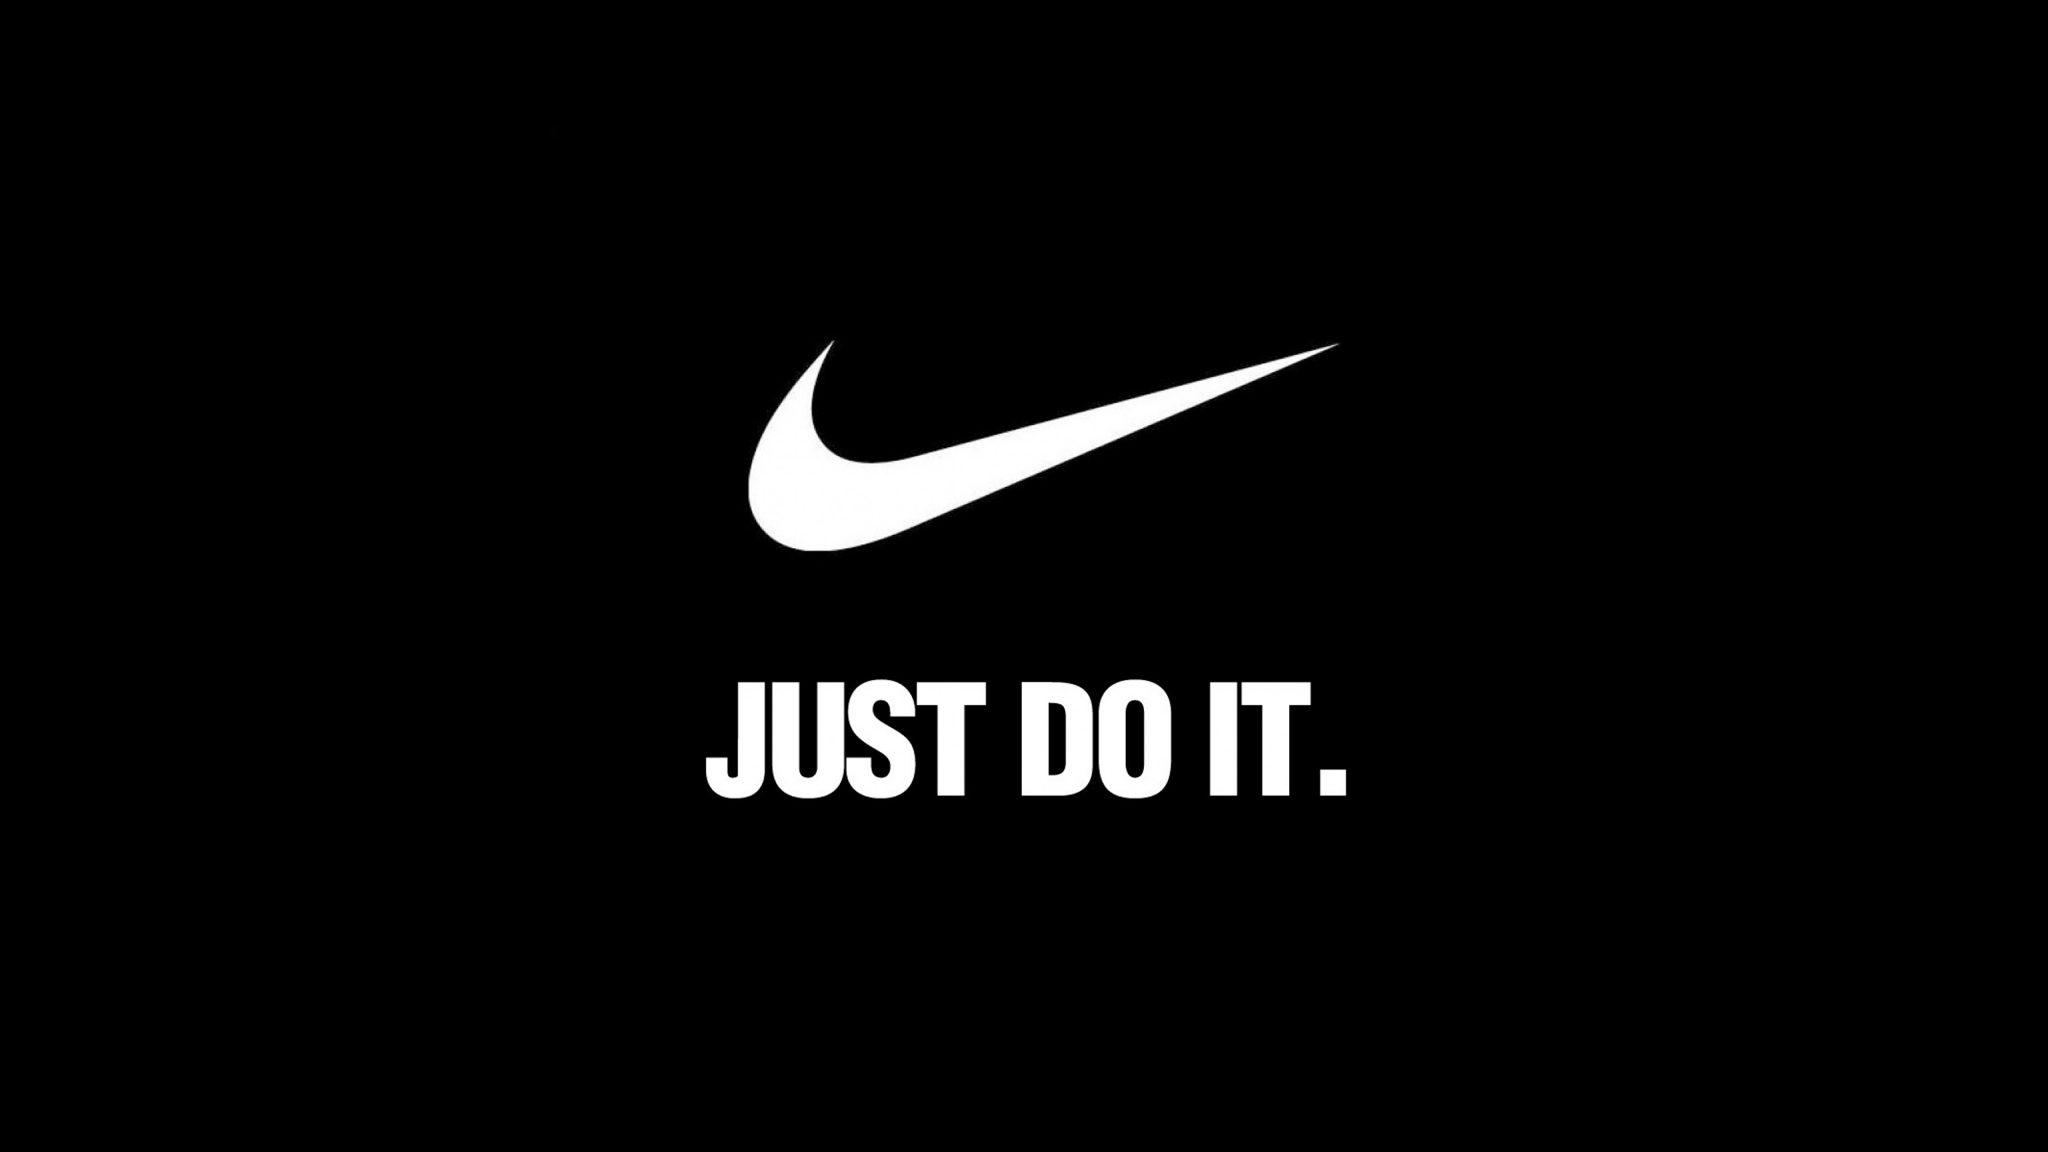 Nike Logo and Tagline